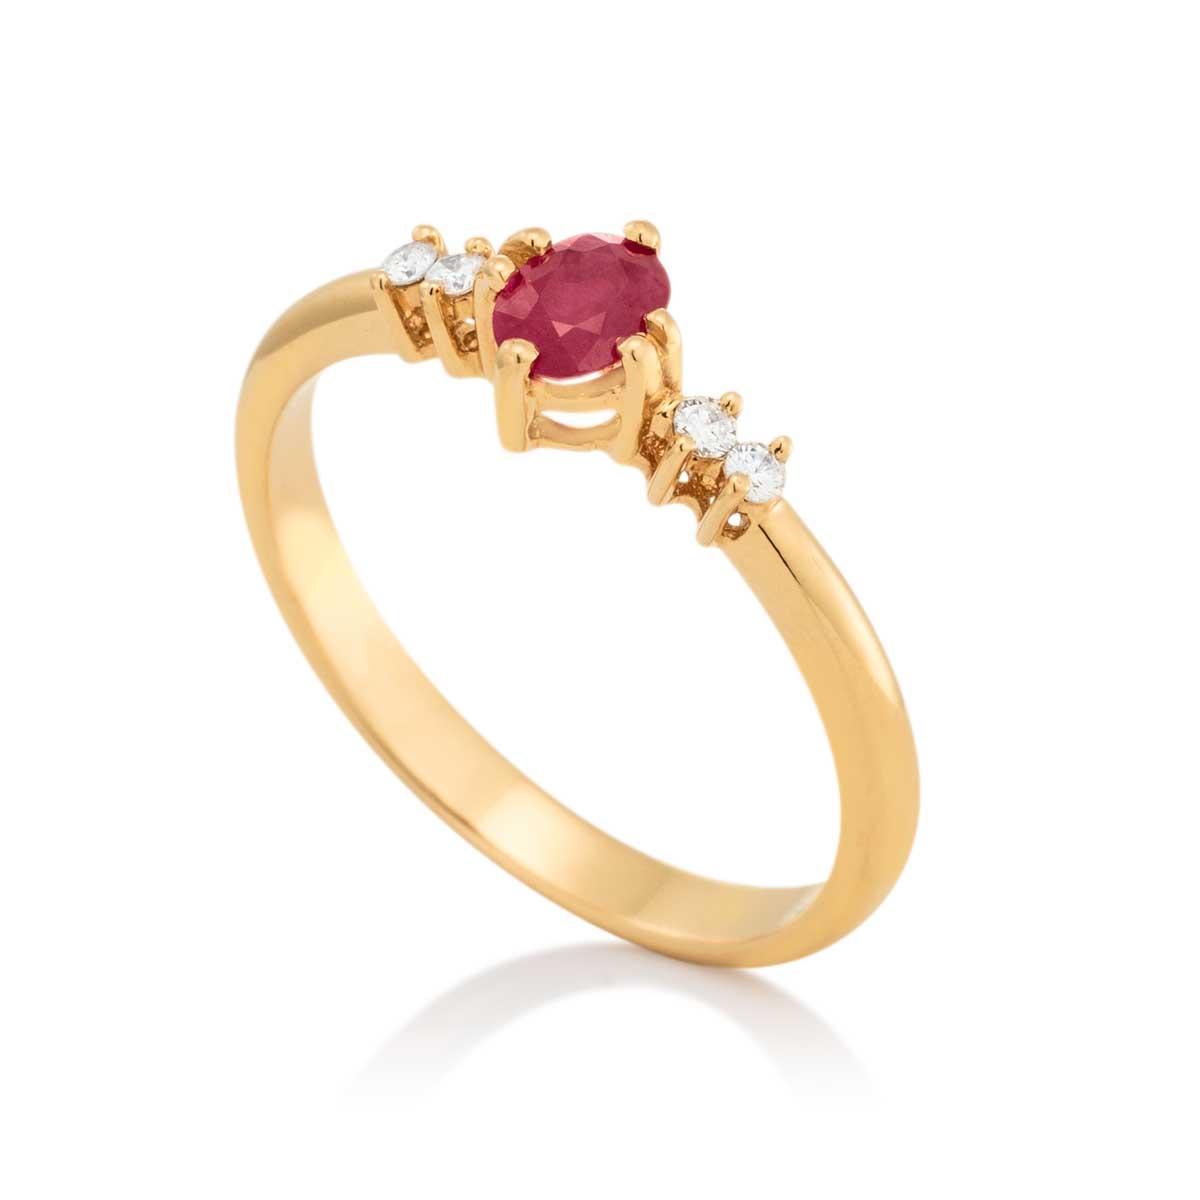 Anel Ouro Amarelo Rubi e Diamante - Colecao Pedras Orientais 350196a13c